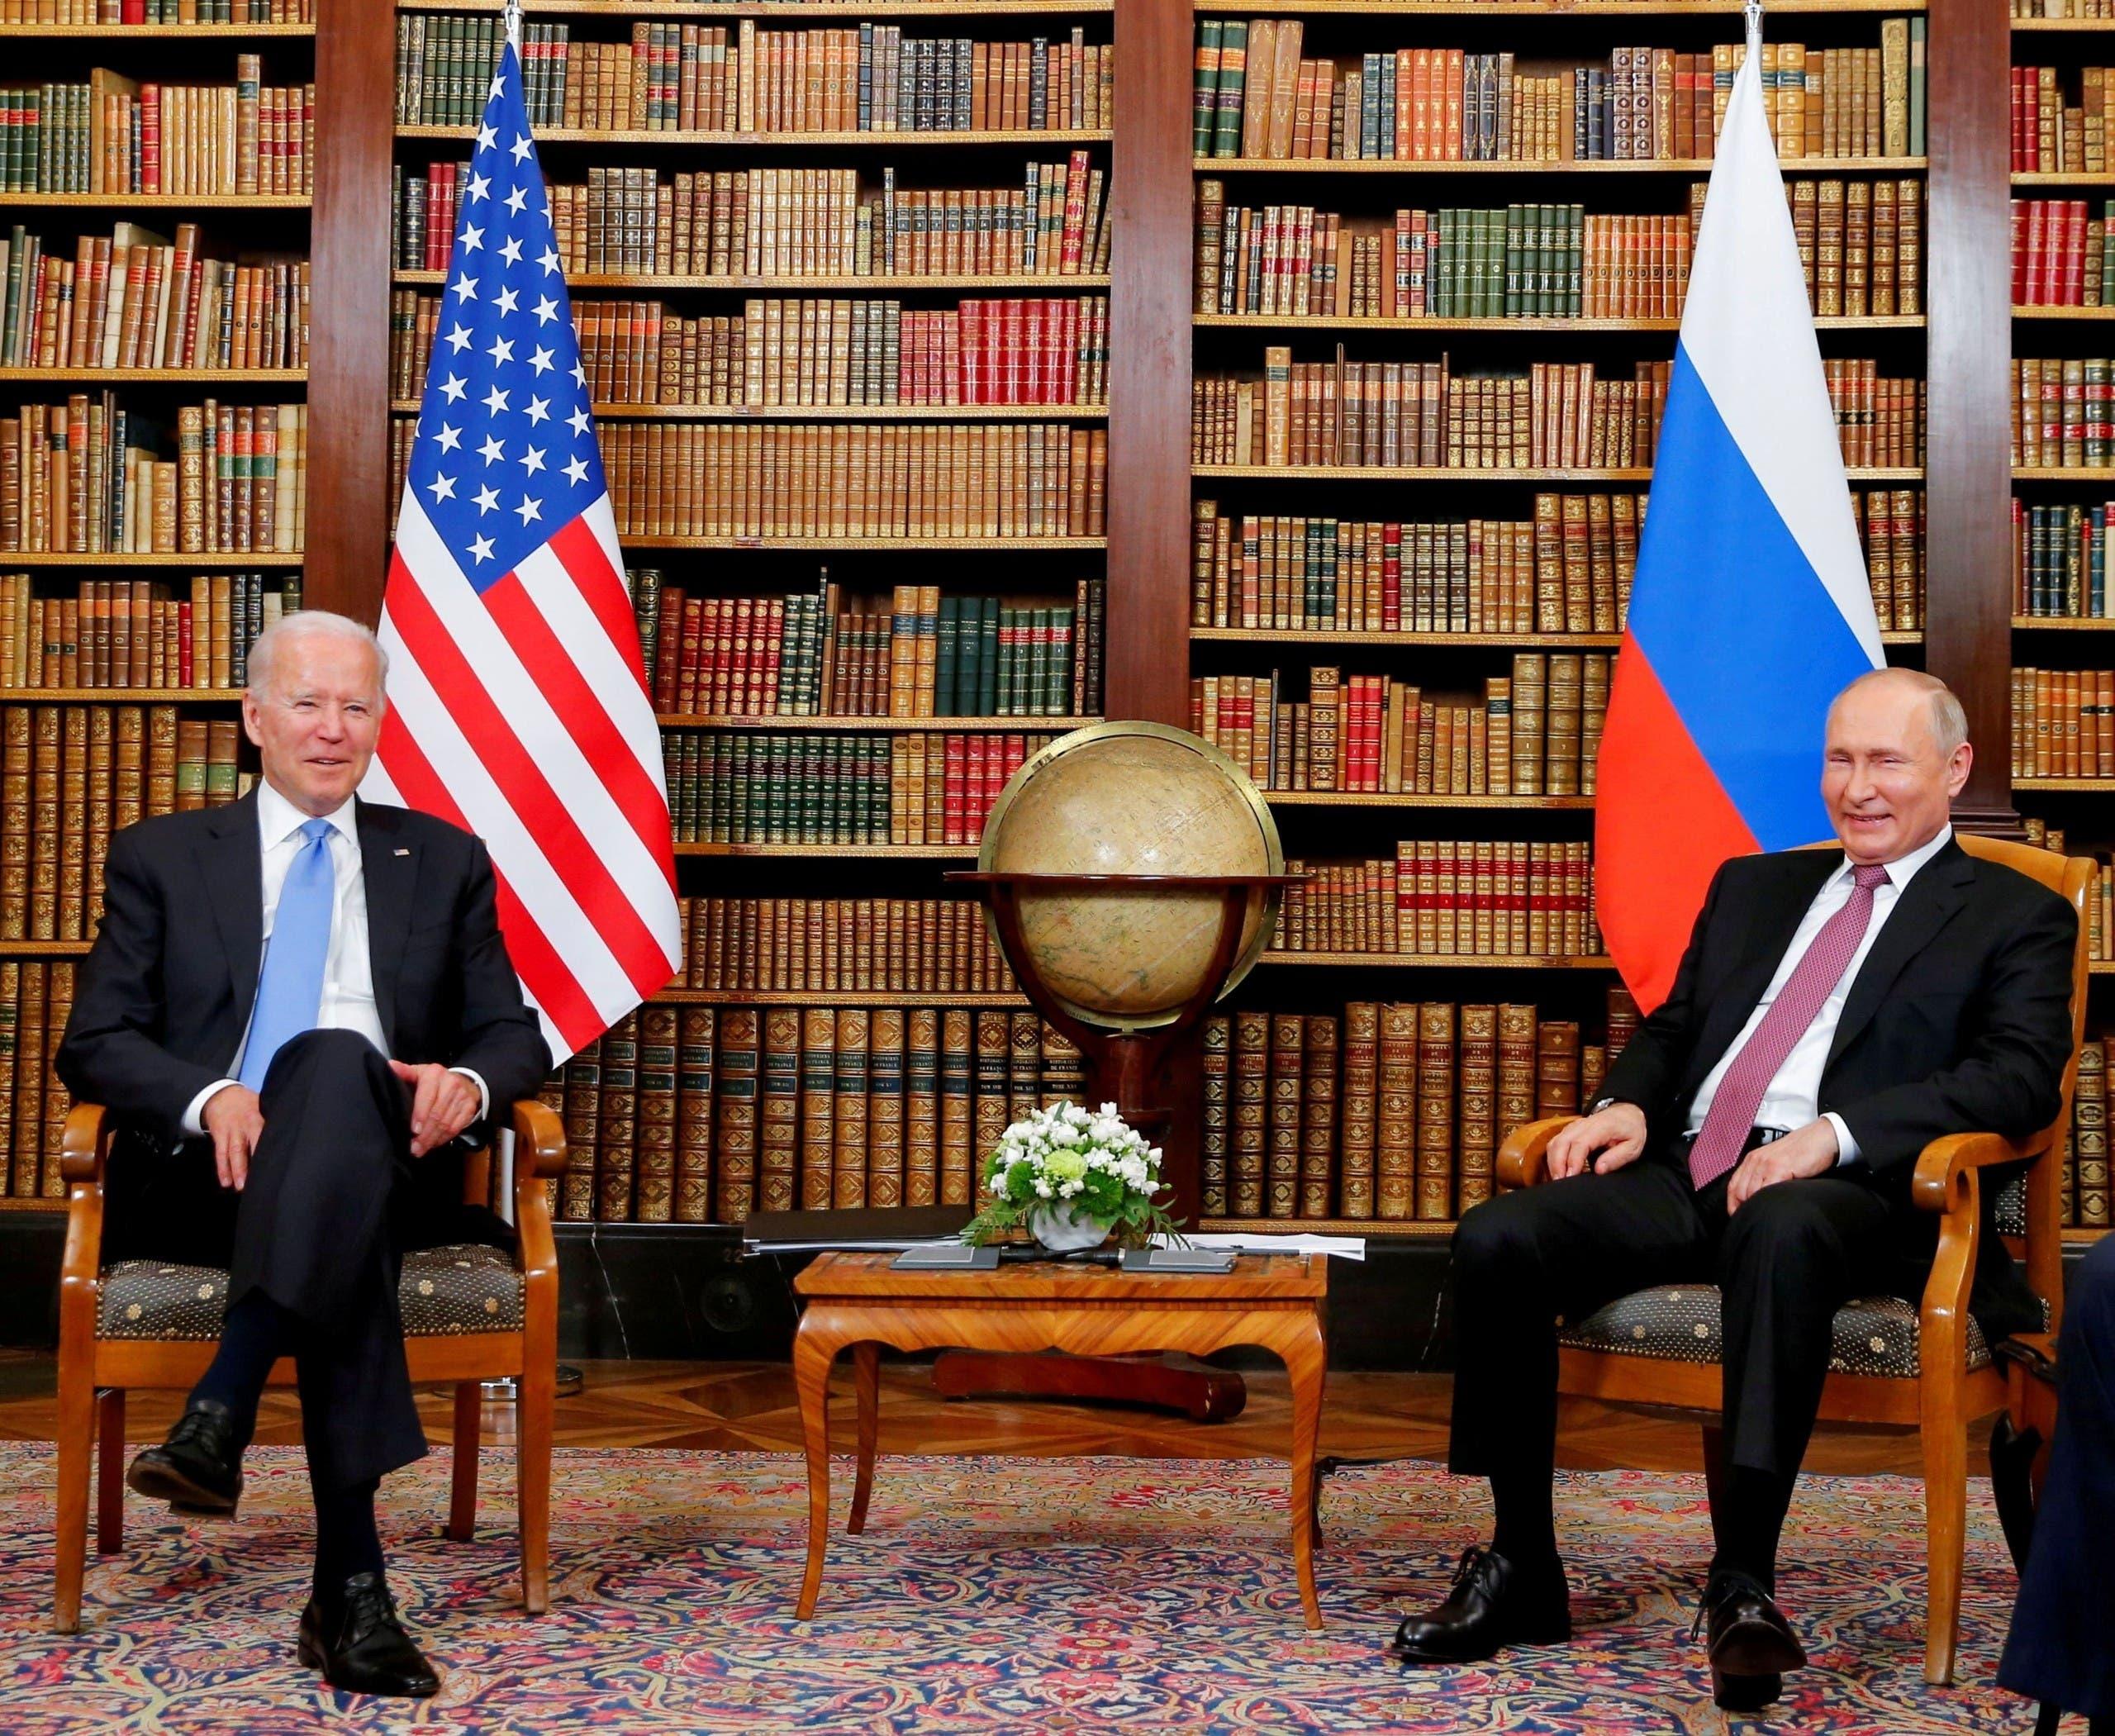 فلاديمير بوتين وجو بايدن في جنيف يوم 16 يونيو 2021 (رويترز)